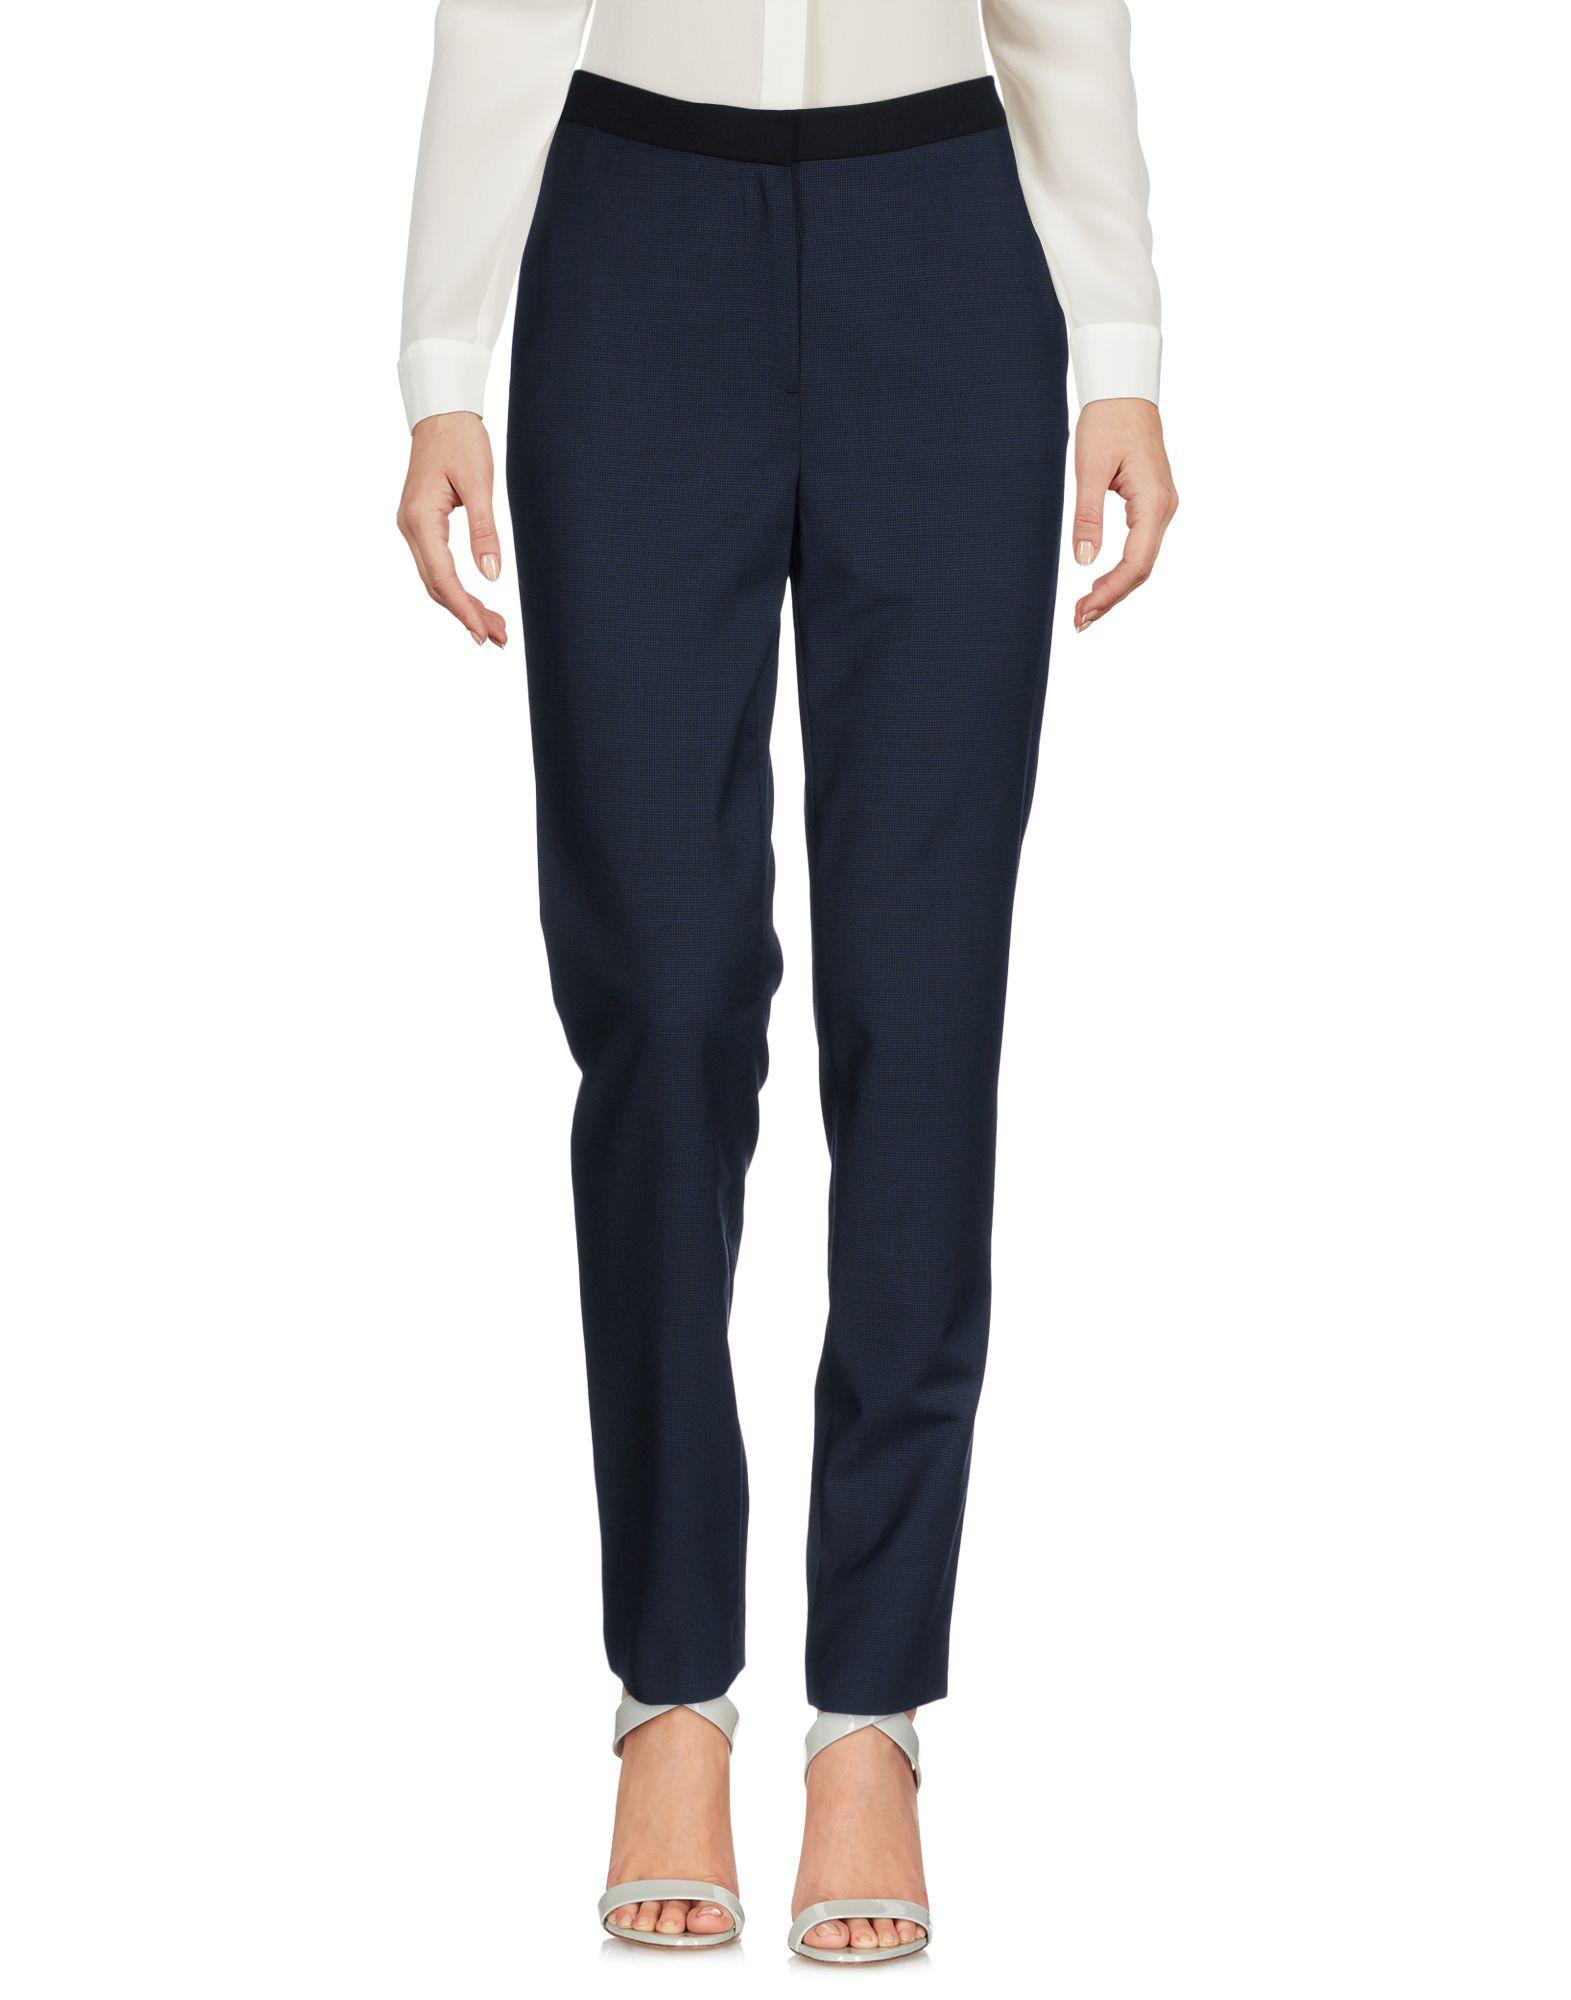 Pantalone Ty-Lr Donna - Acquista online su 5WqPTYi